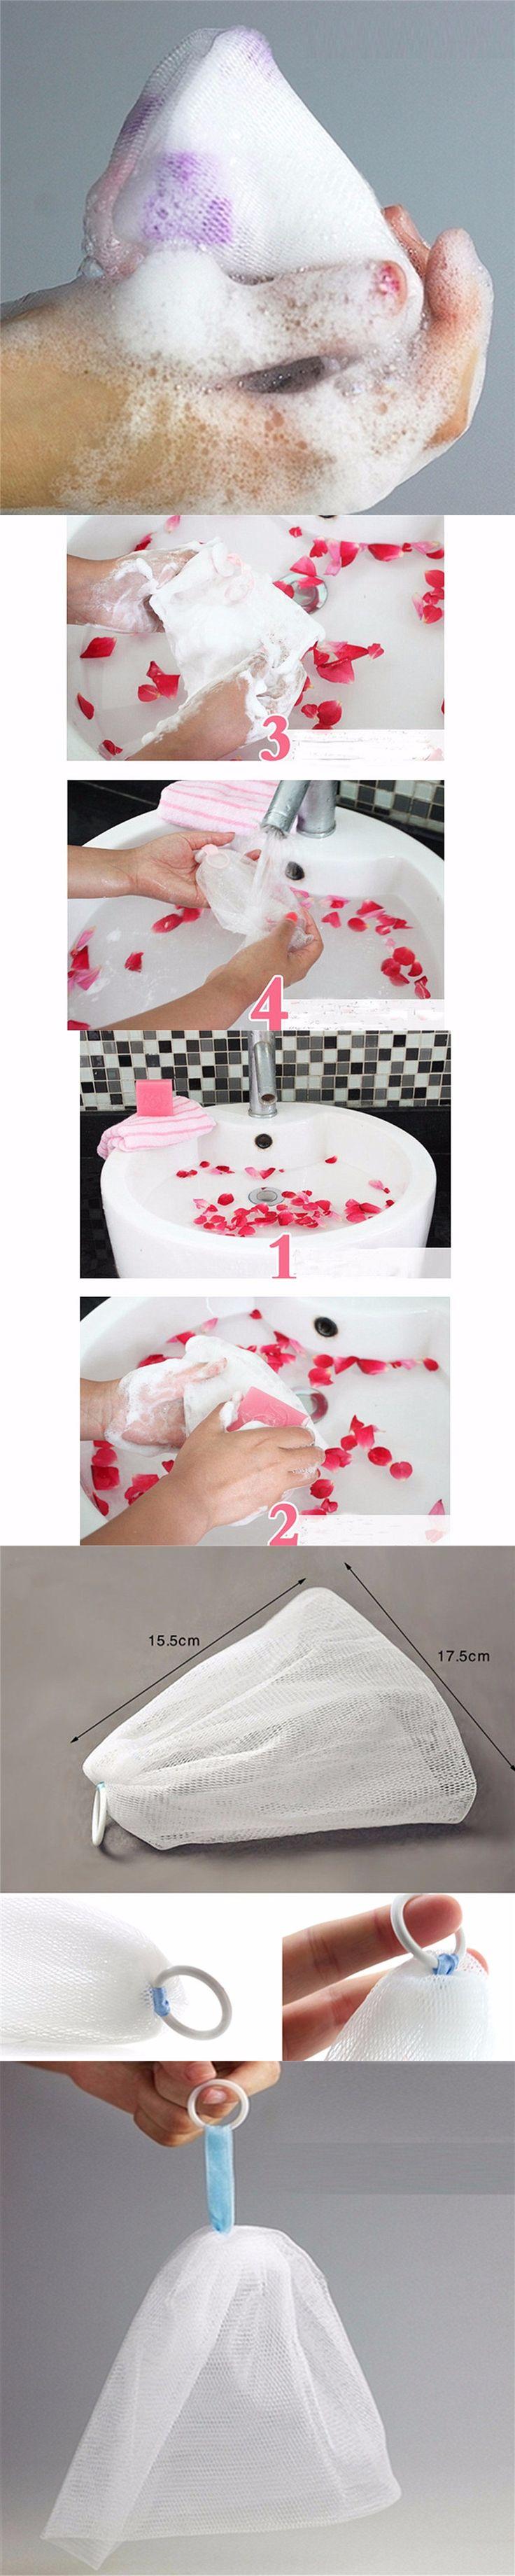 Double-layer Soap Net White Foaming Net Face Washing Bath Skin Care Practical Soap Blister Mesh Soap Net Bath Shower Tools